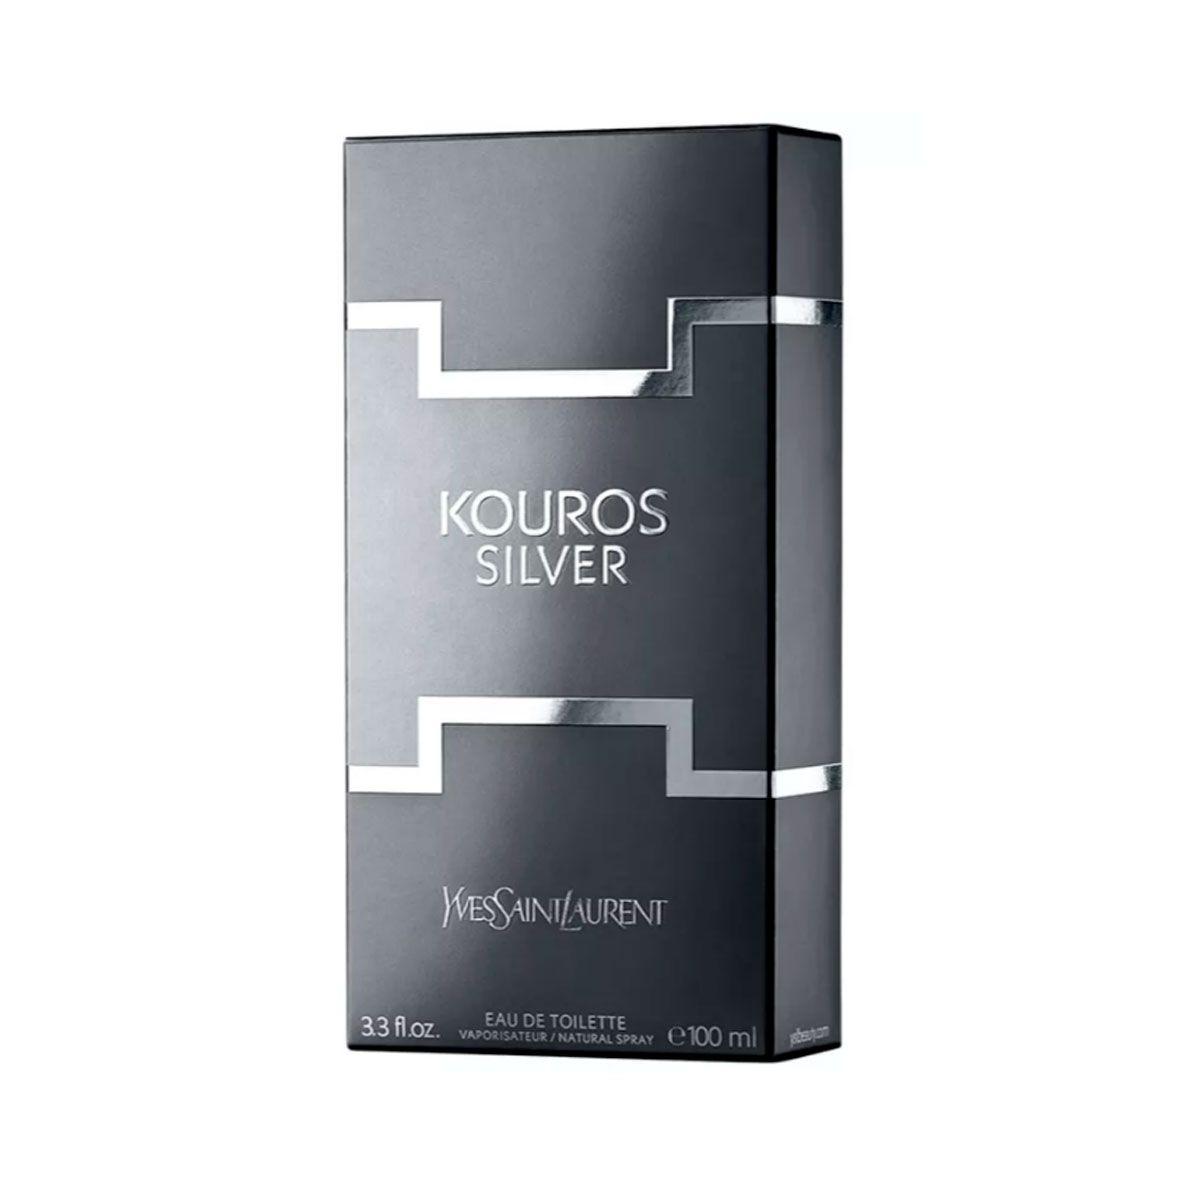 dd129e0fed Perfume Masculino Yves Saint Laurent Kouros Silver Eau de Toilette 50ml